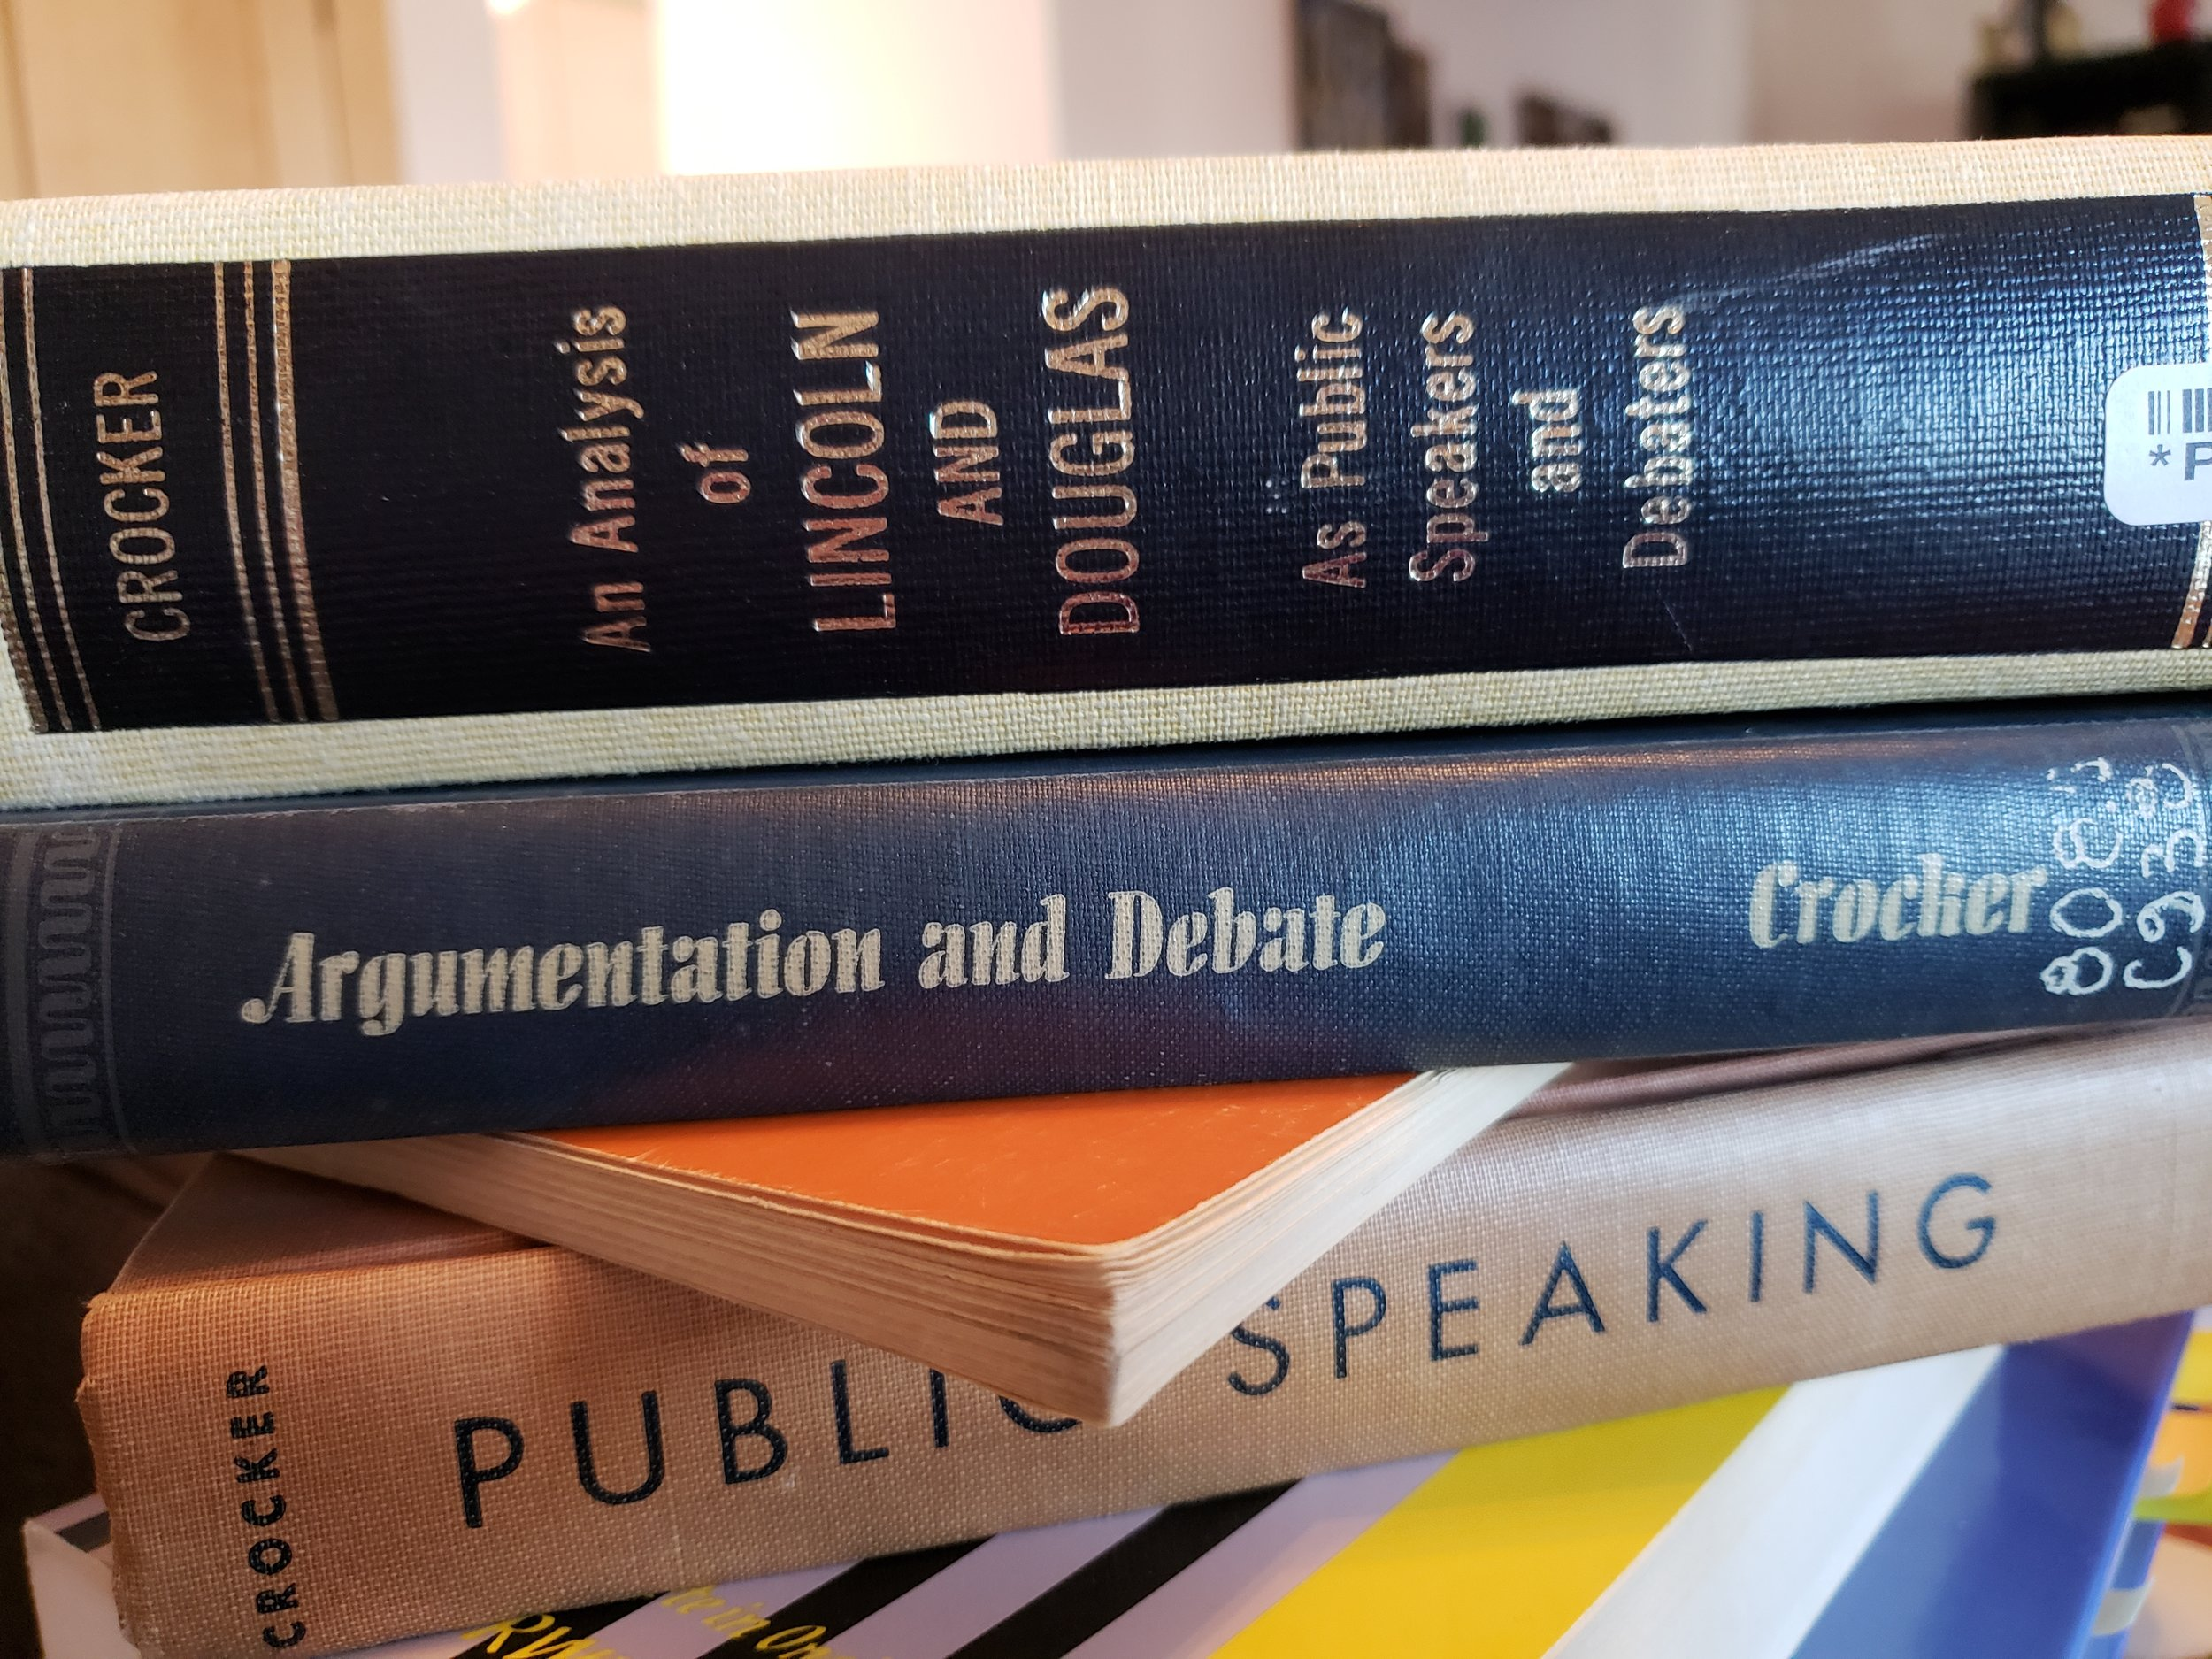 books by Professor Lionel Crocker, Ph.D.